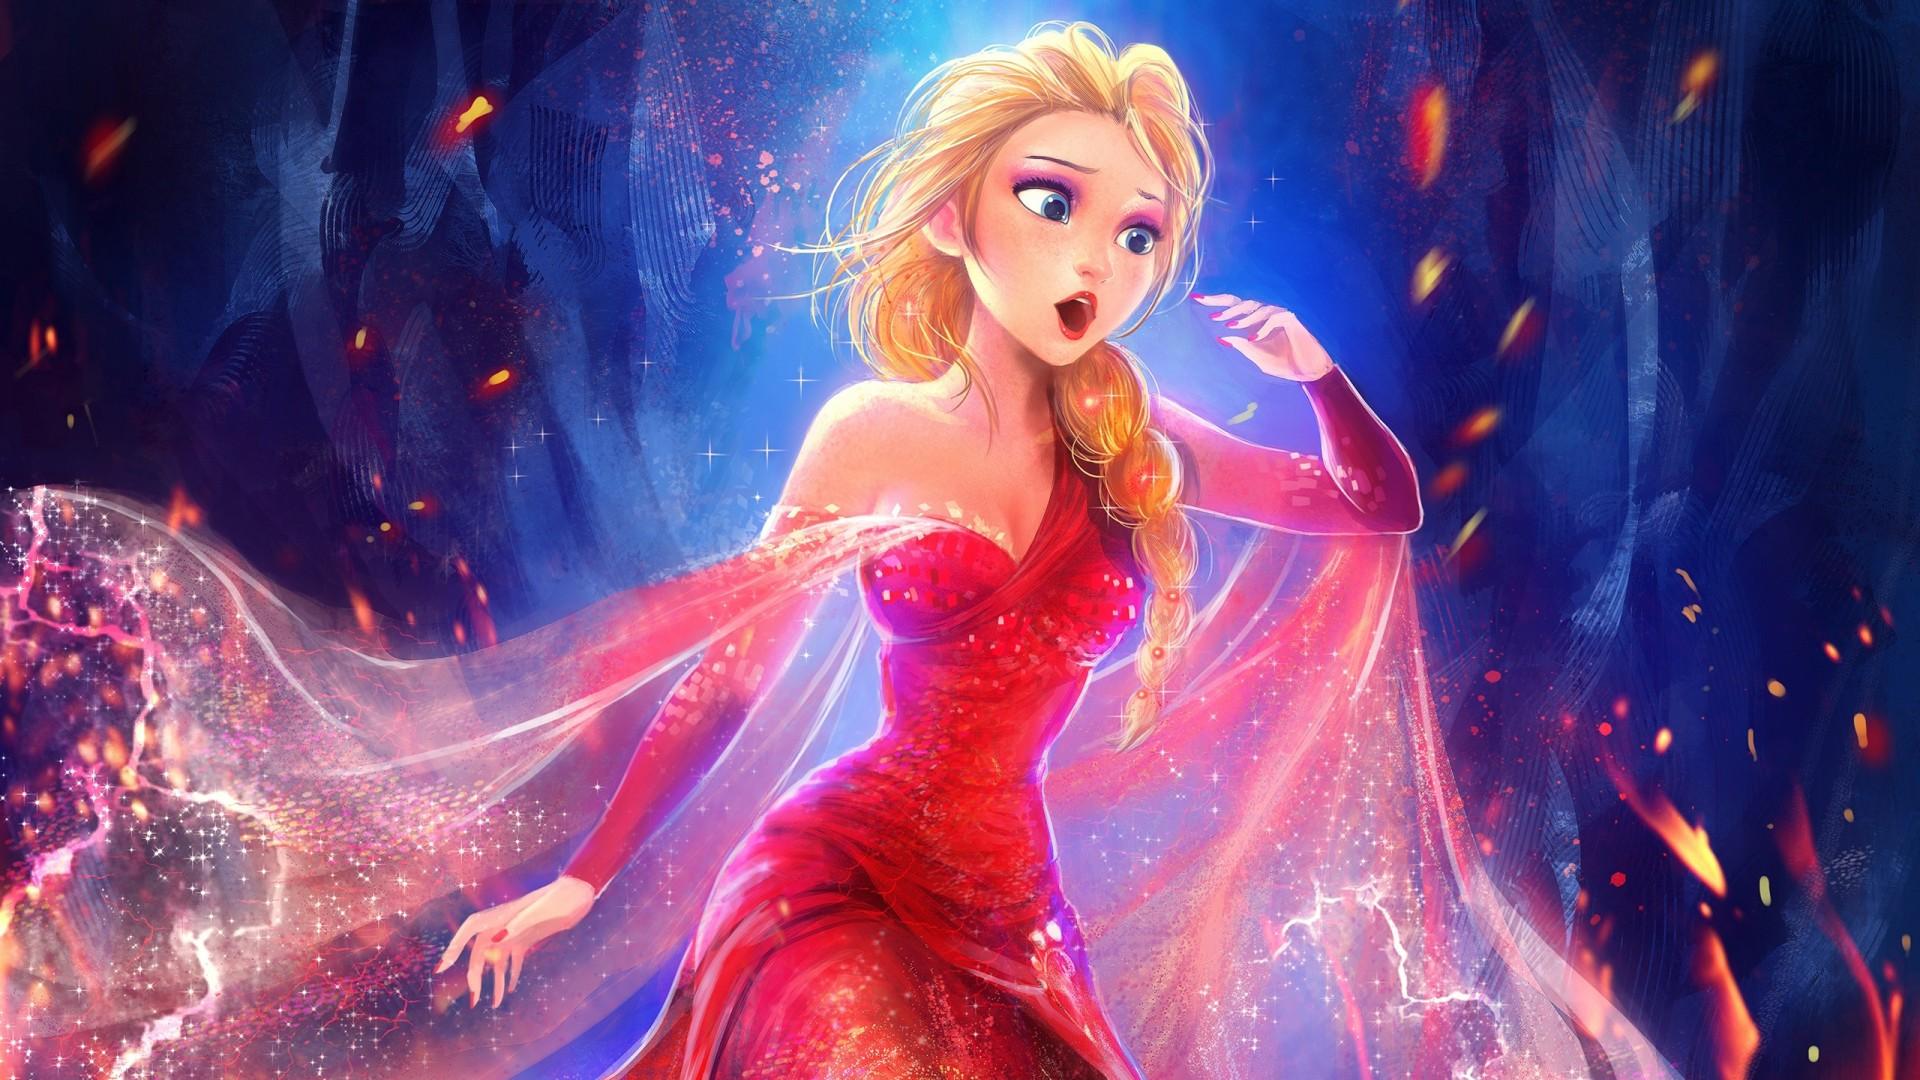 Cars Disney Wallpapers Full Hd Queen Elsa Wallpapers Hd Wallpapers Id 19007